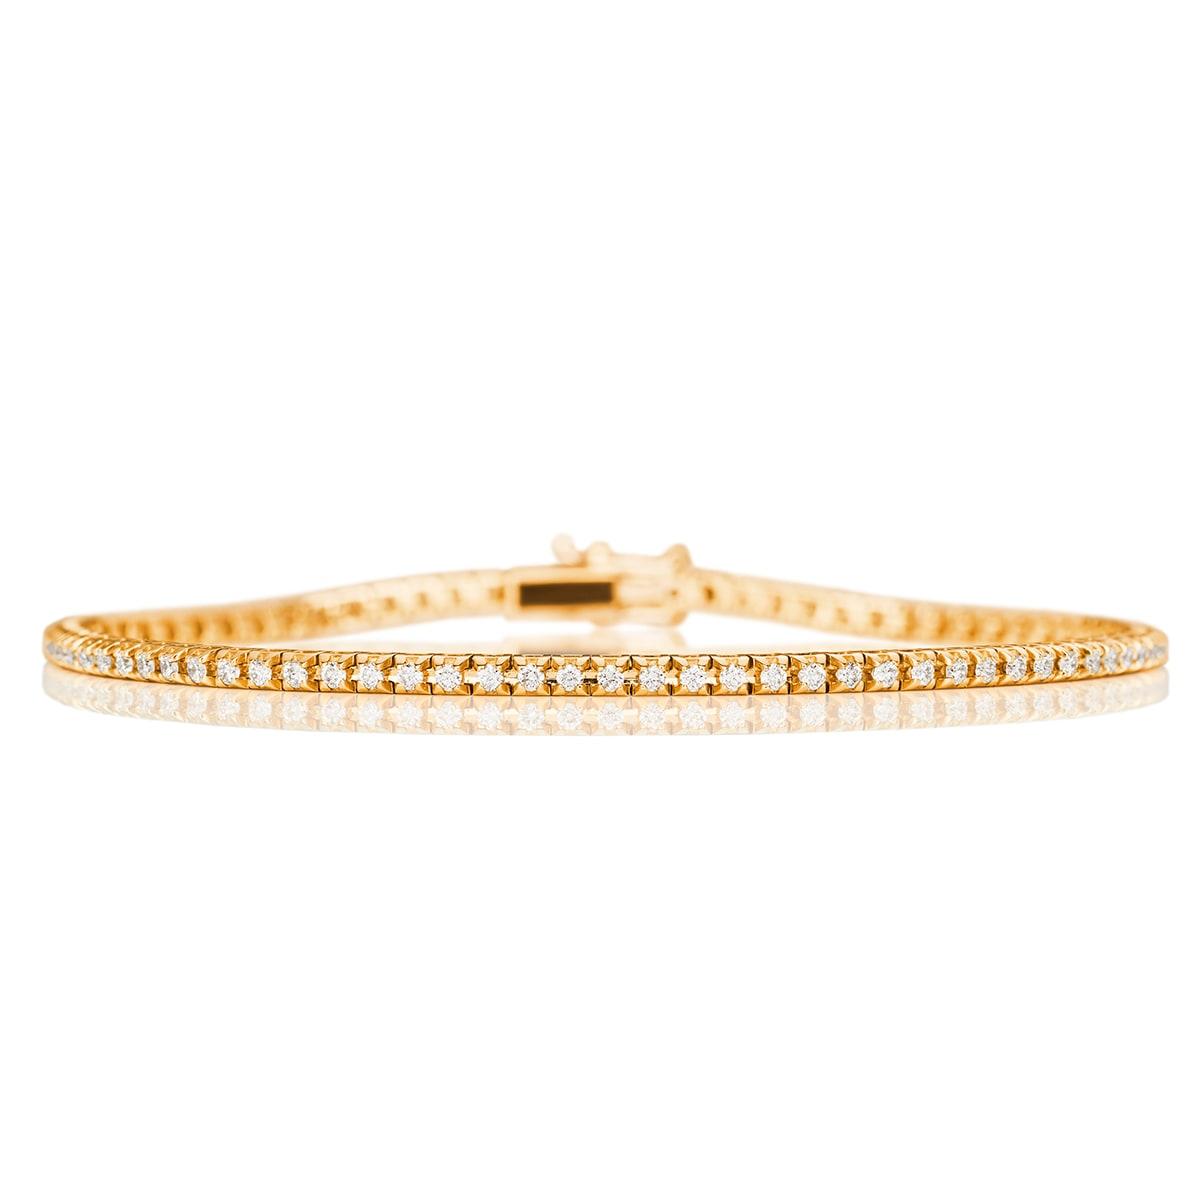 Sandin_Selected_IL_Riviera_RG_190703_0273_diamantarmband_hos_Jarl_Sandin